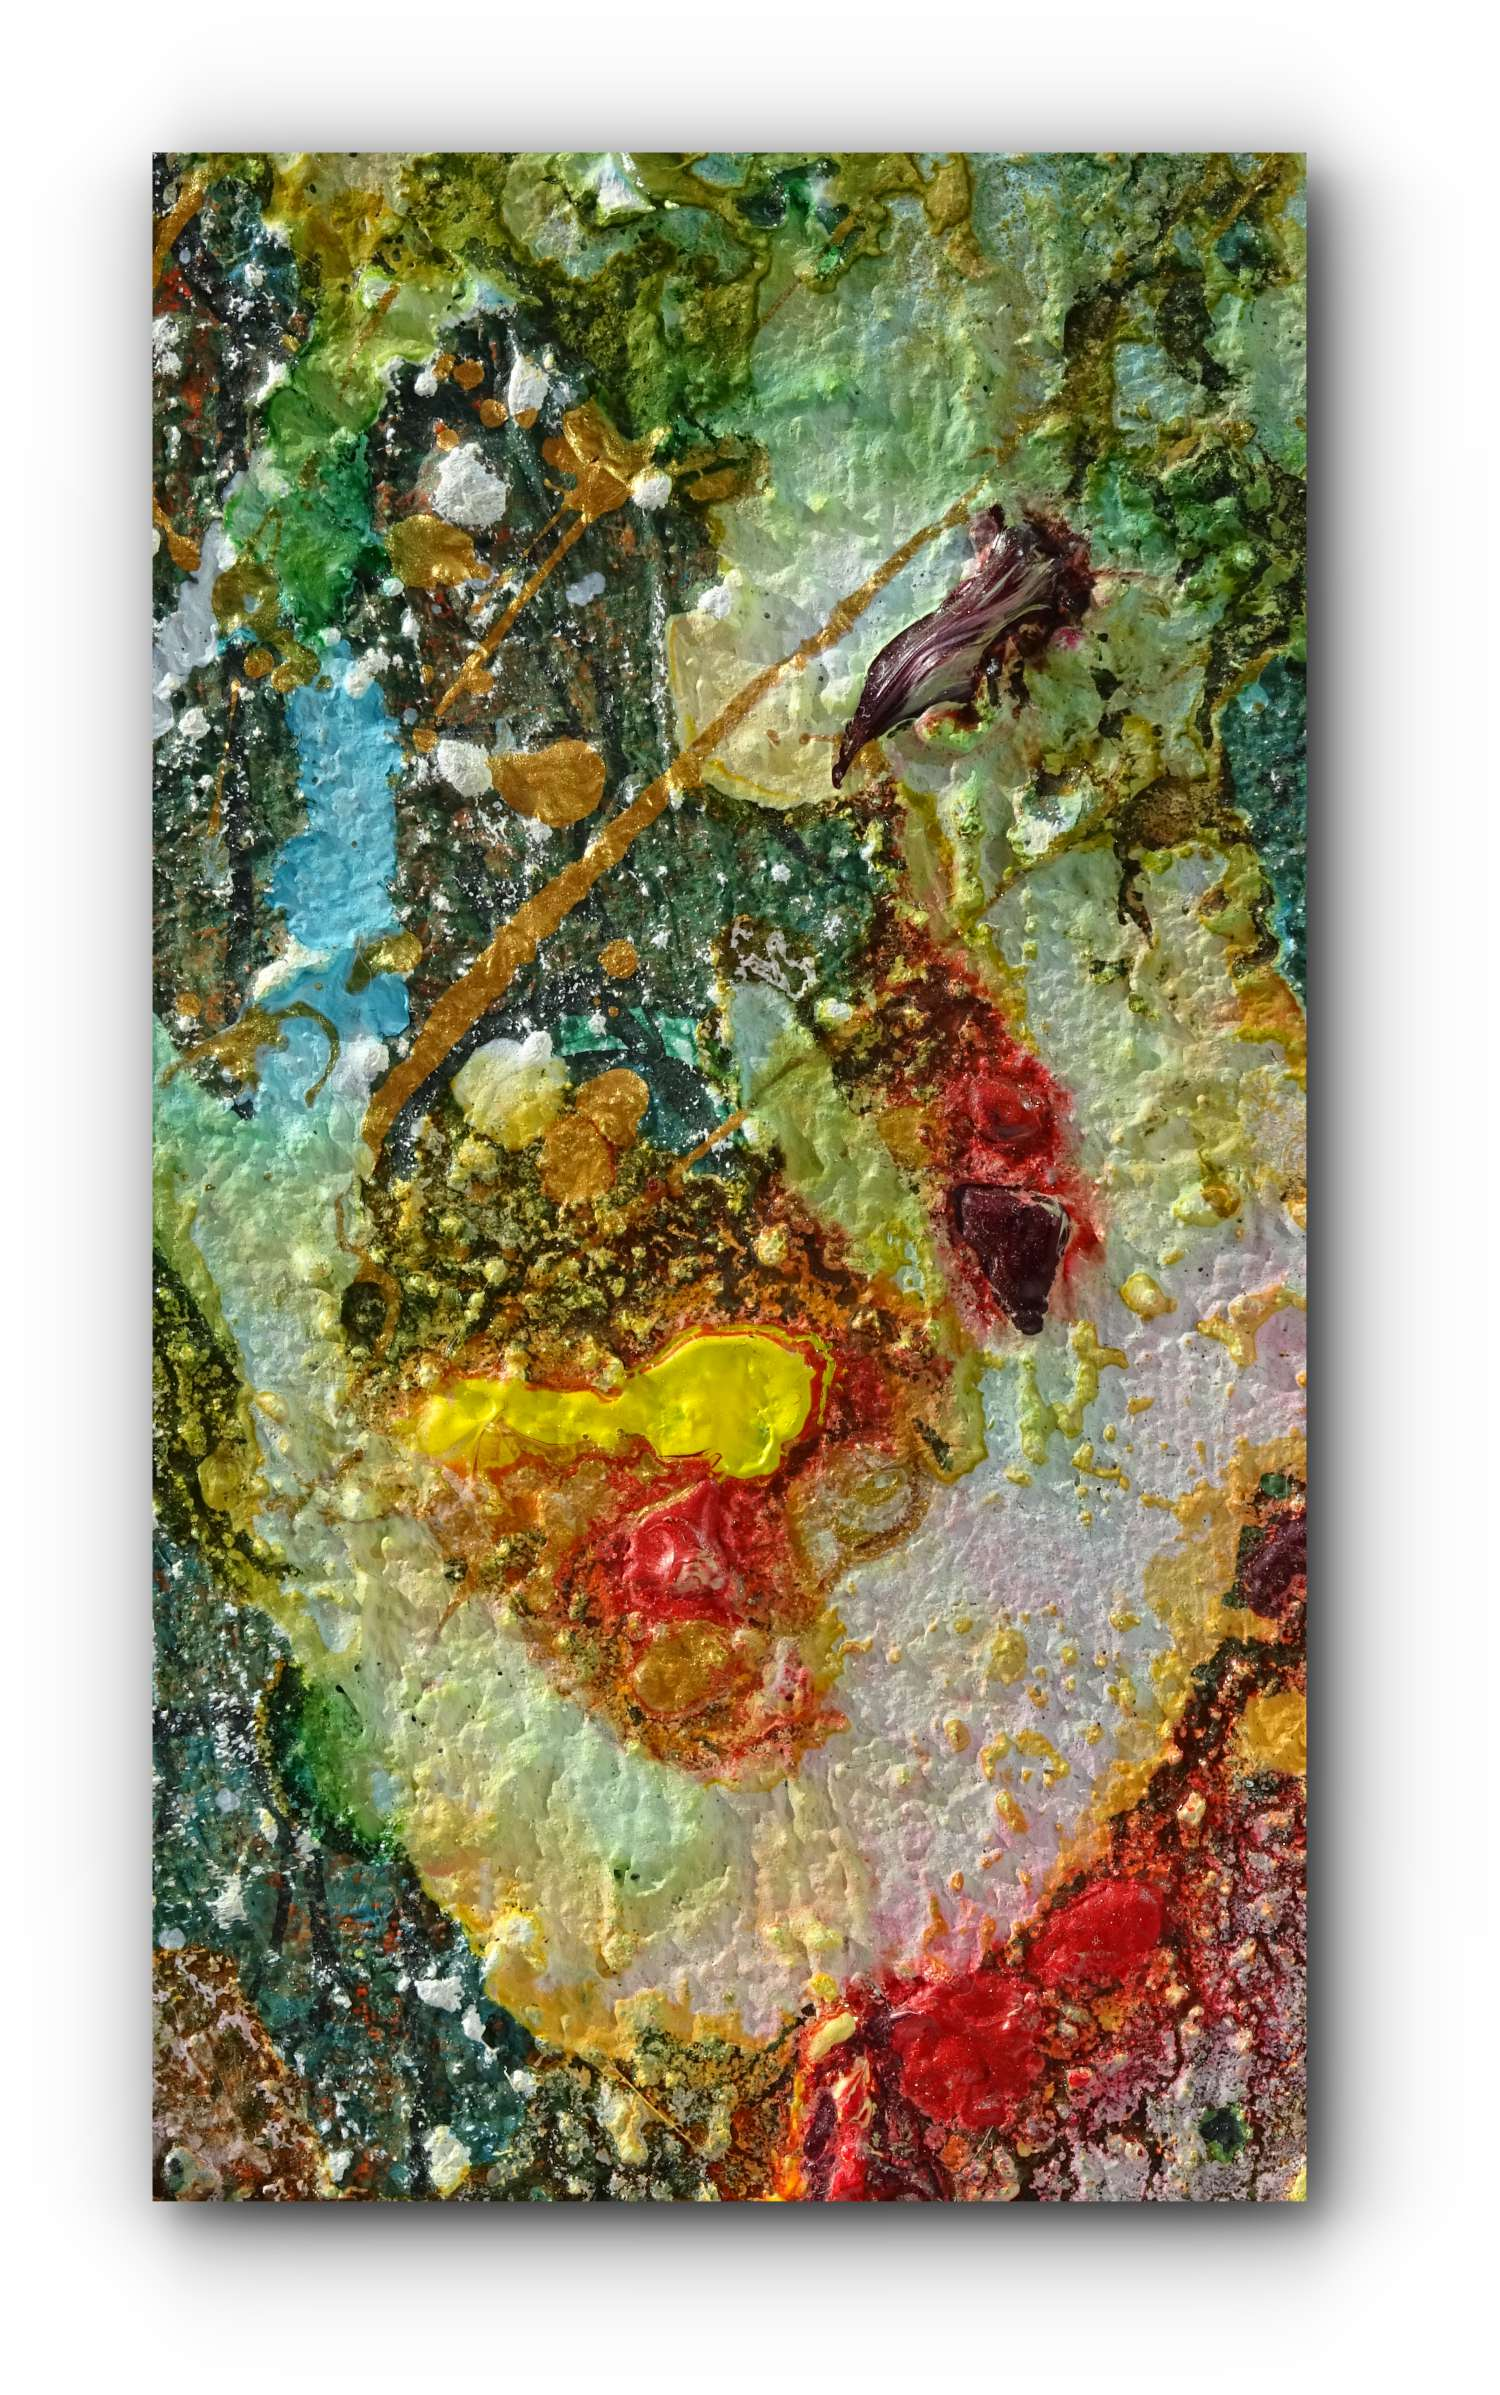 painting-detail-1-ritual-five-artists-ingress-vortices.jpg